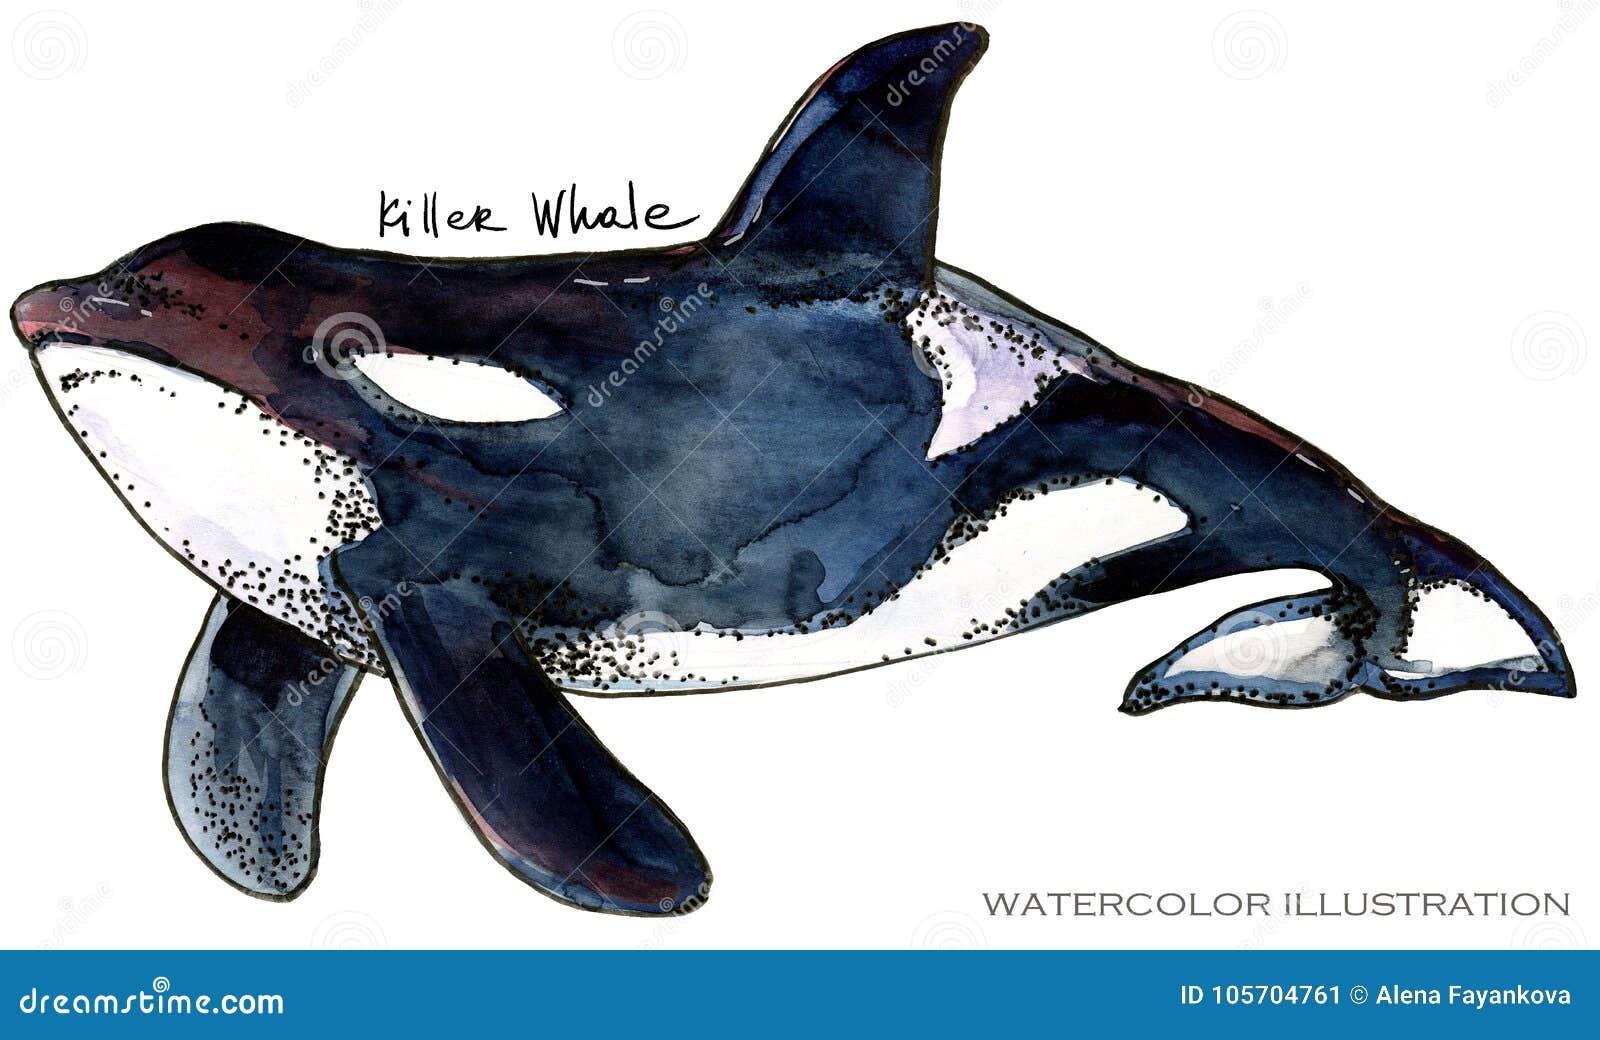 Killer Whale. underwater life watercolor illustration. sea animal